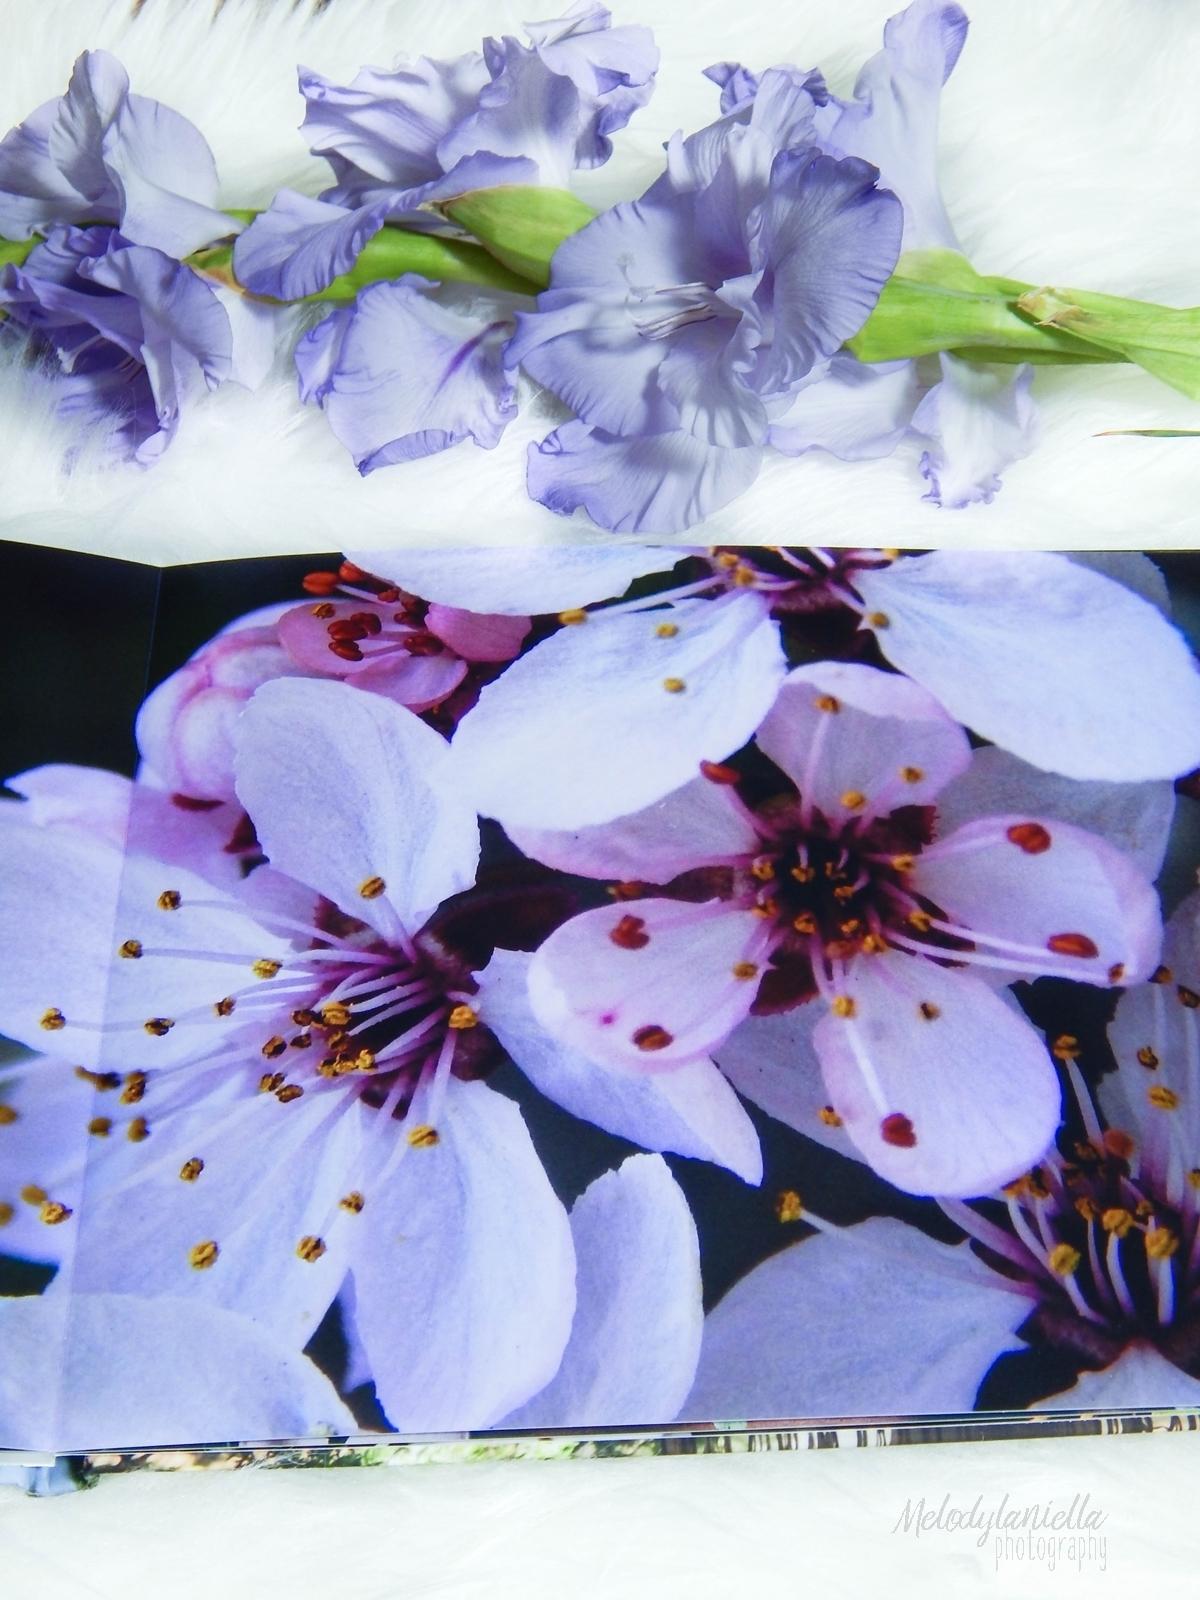 saal digital fotoksiązka recenzja melodylaniella blog pomysl na prezent fotografia fotograficzne prezenty .JPG melodylaniella photography